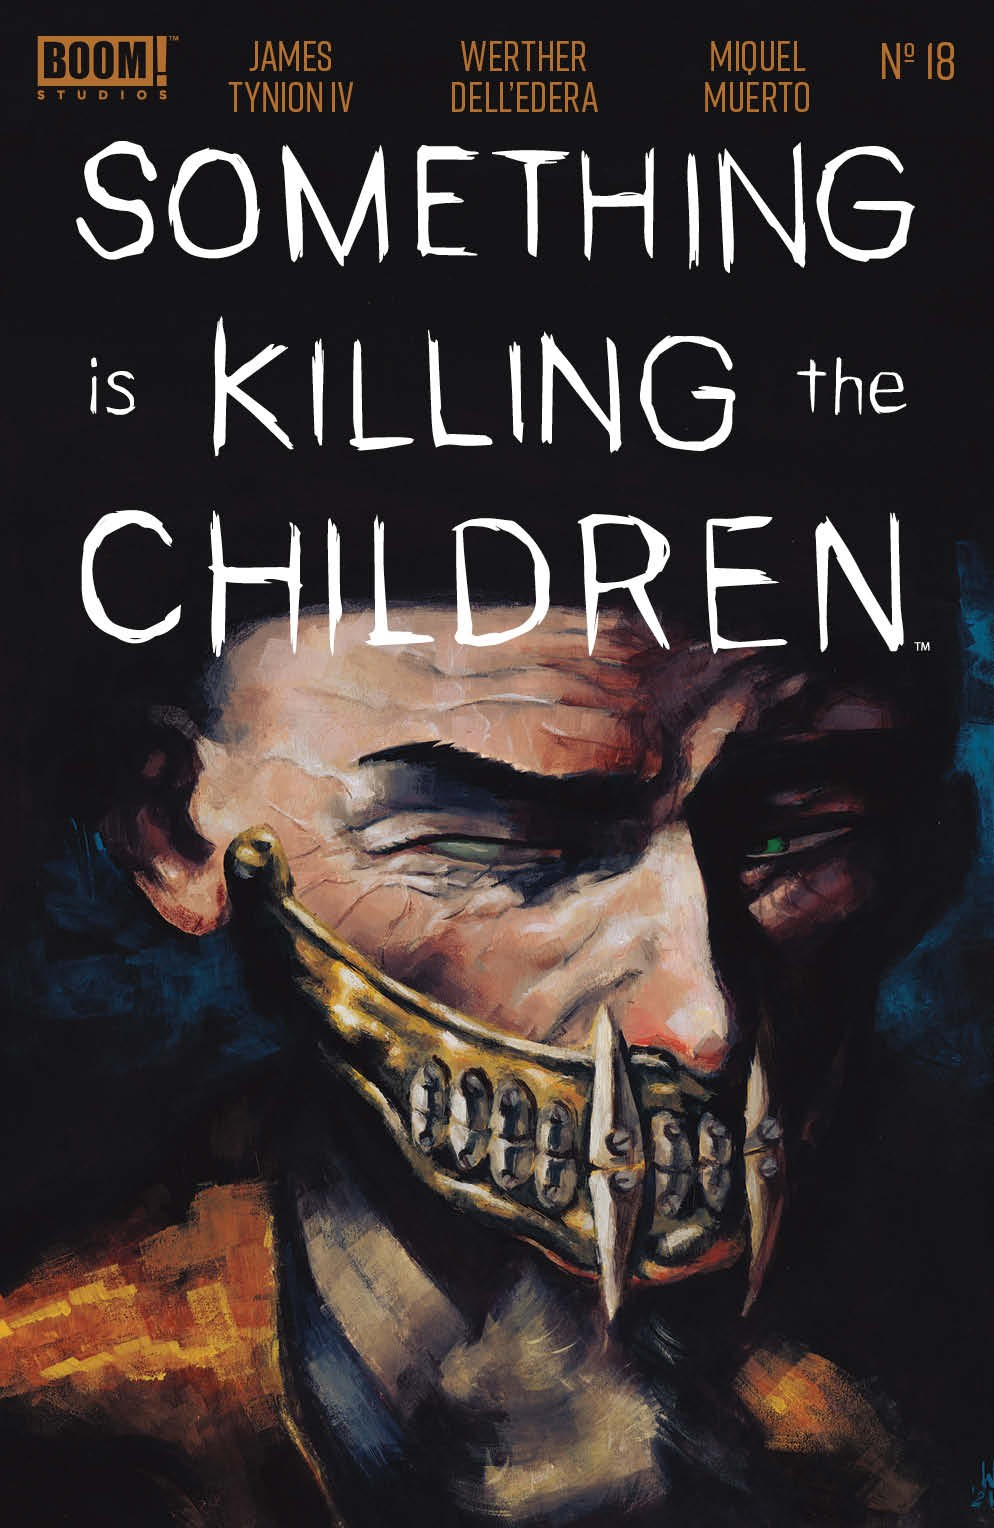 SomethingKillingChildren_018_Cover_A_Main ComicList: BOOM! Studios New Releases for 07/28/2021